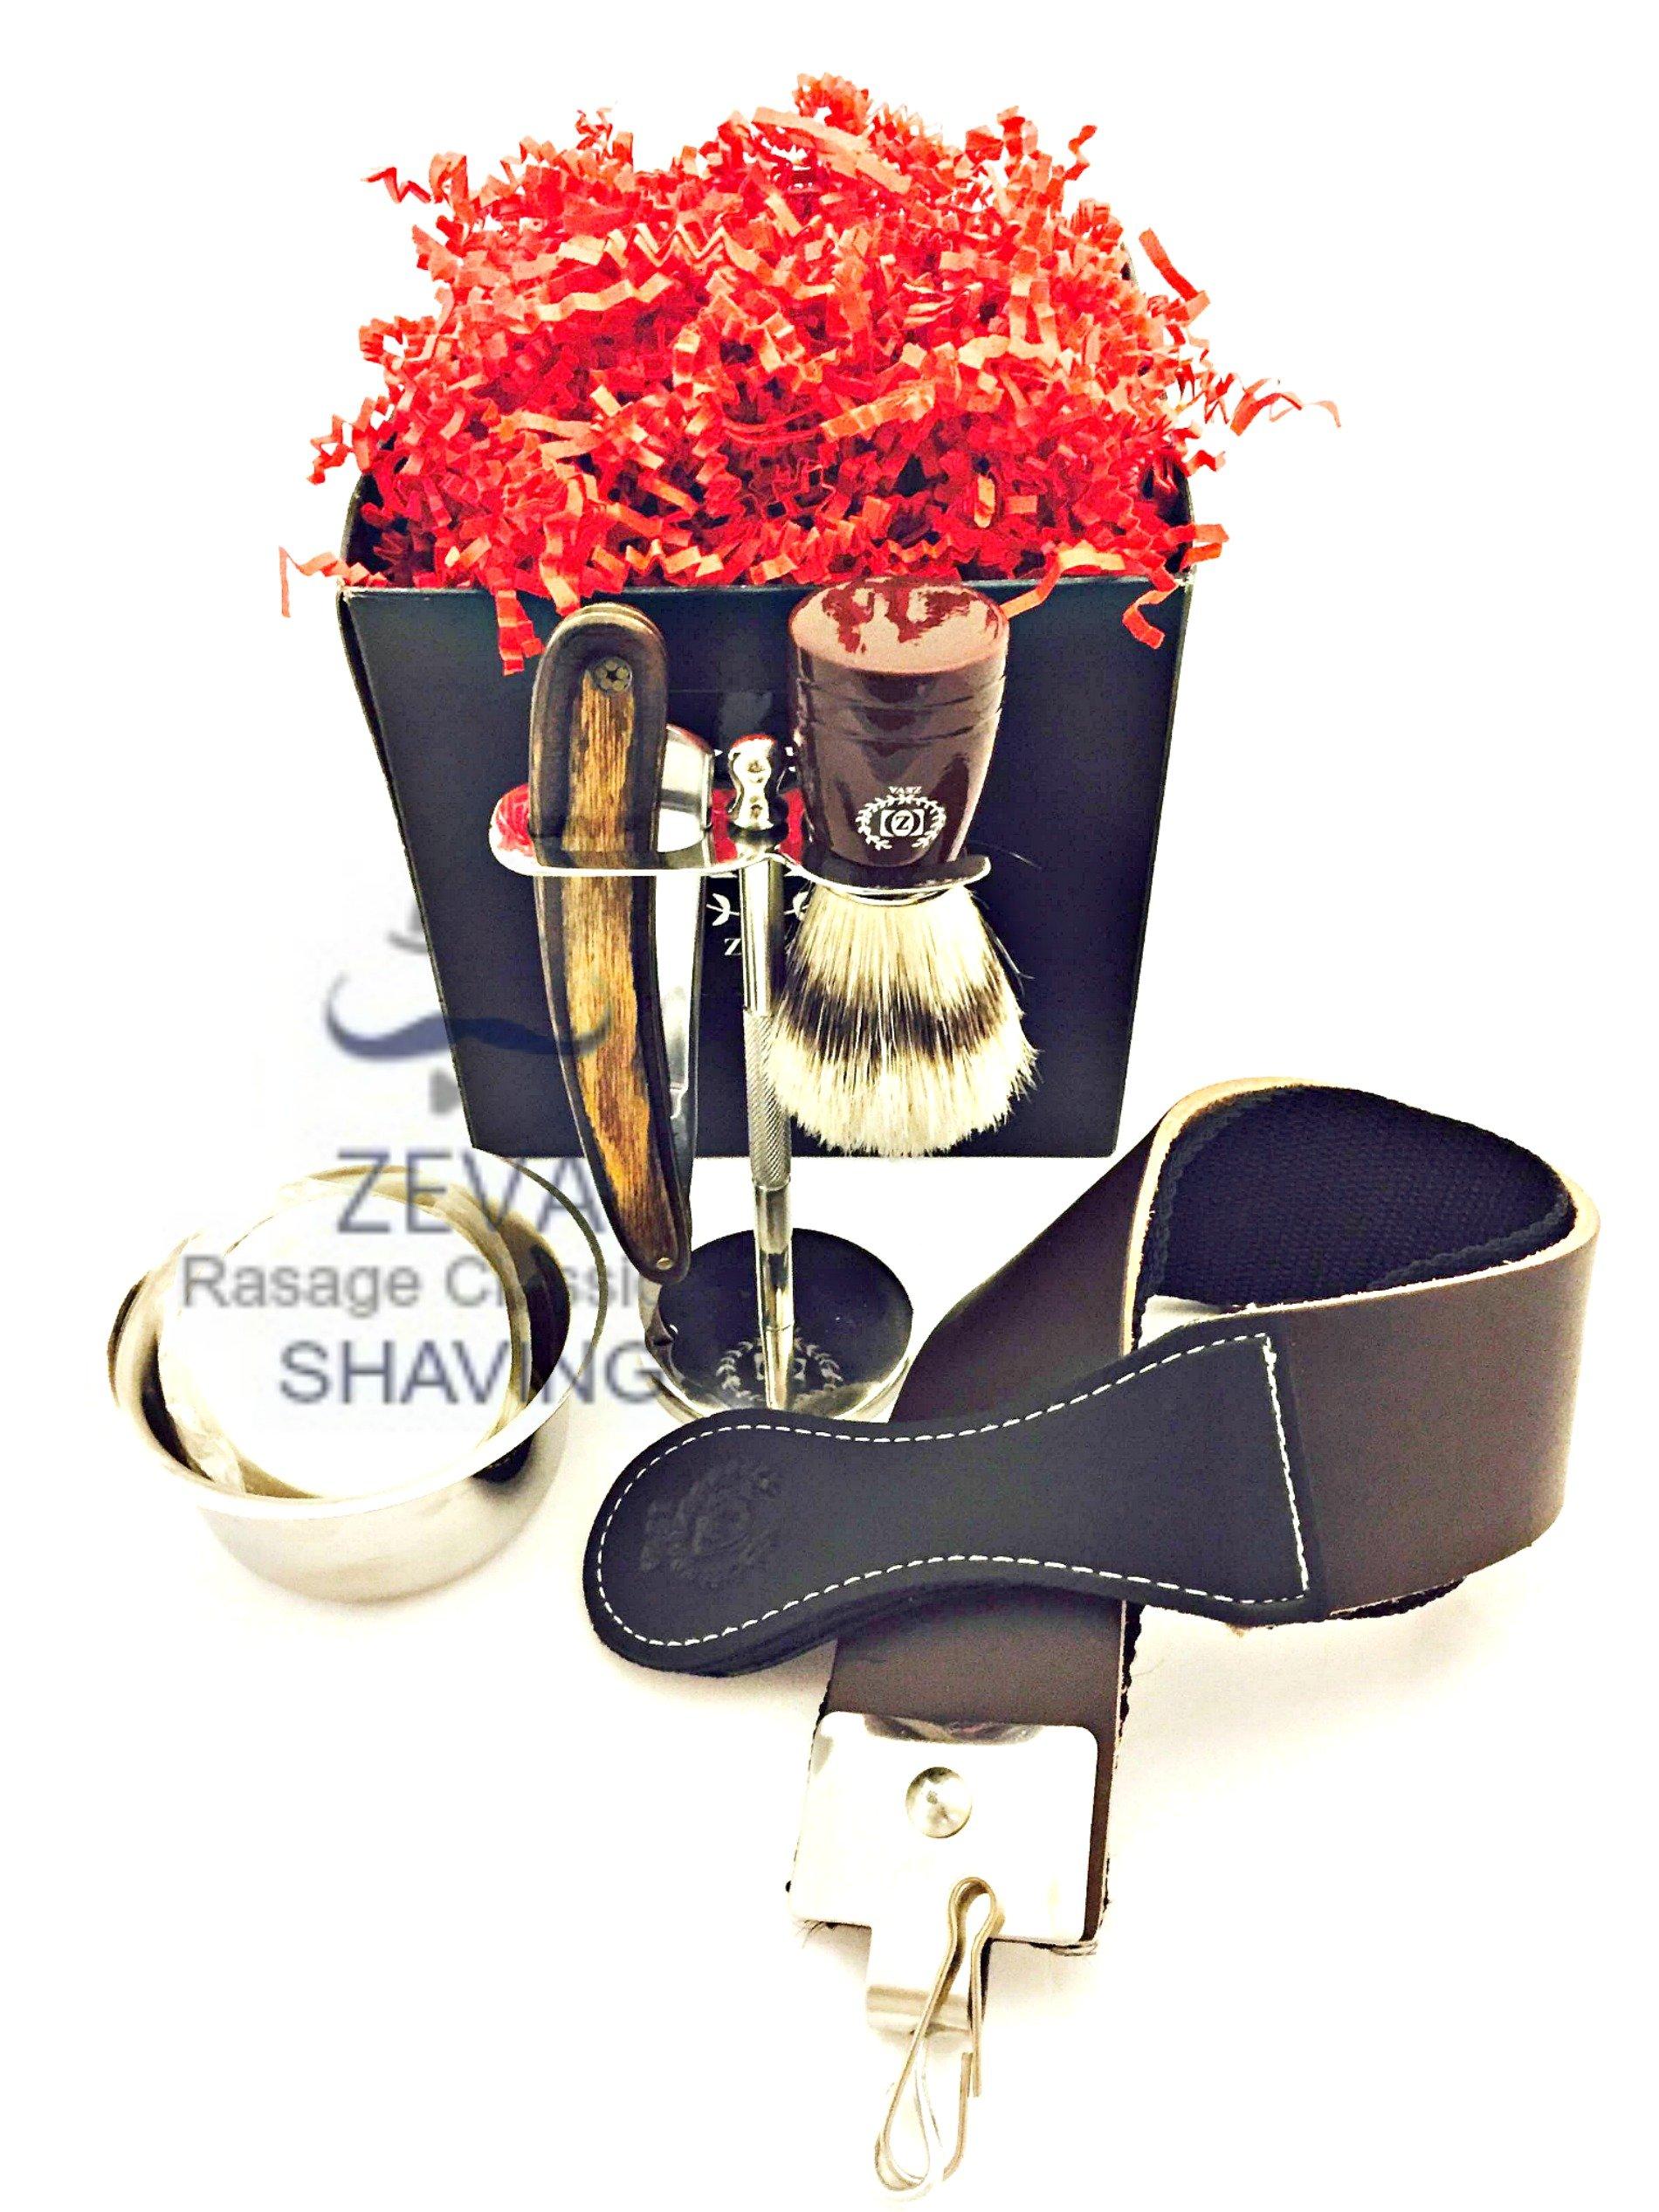 Straight Razor Cut Throat Shavette Mens Shaving Classic Shave -Comes in Gift Box- Men Grooming Shaving kit High Quality Stainless Steel Razor Leather Strap / Strop for Straight razor honing sharpening